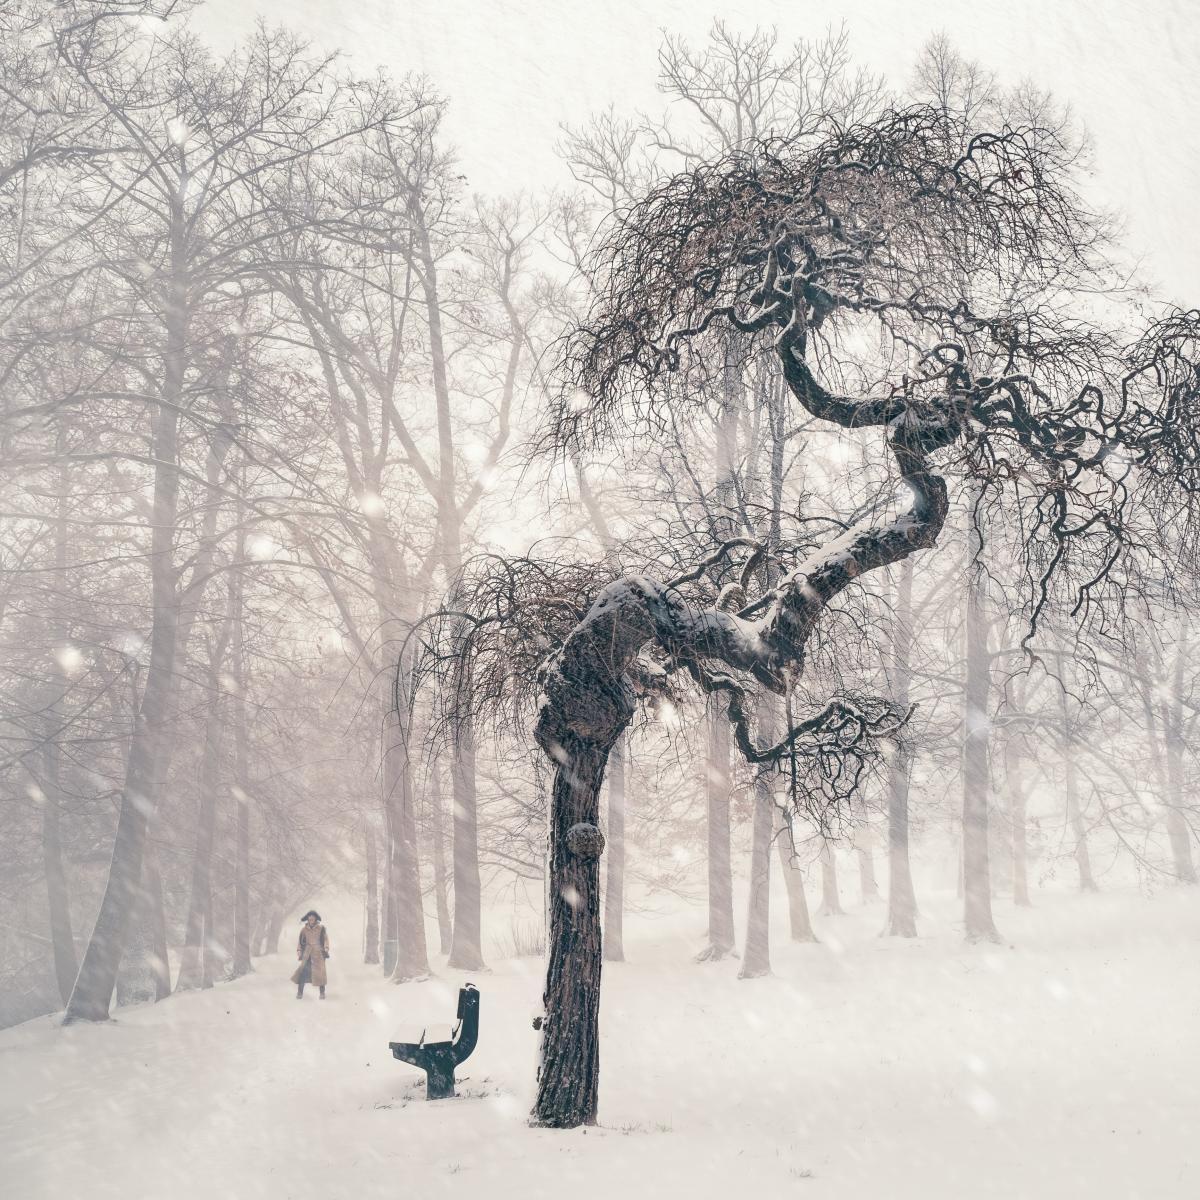 Snow Ice Winter #216162